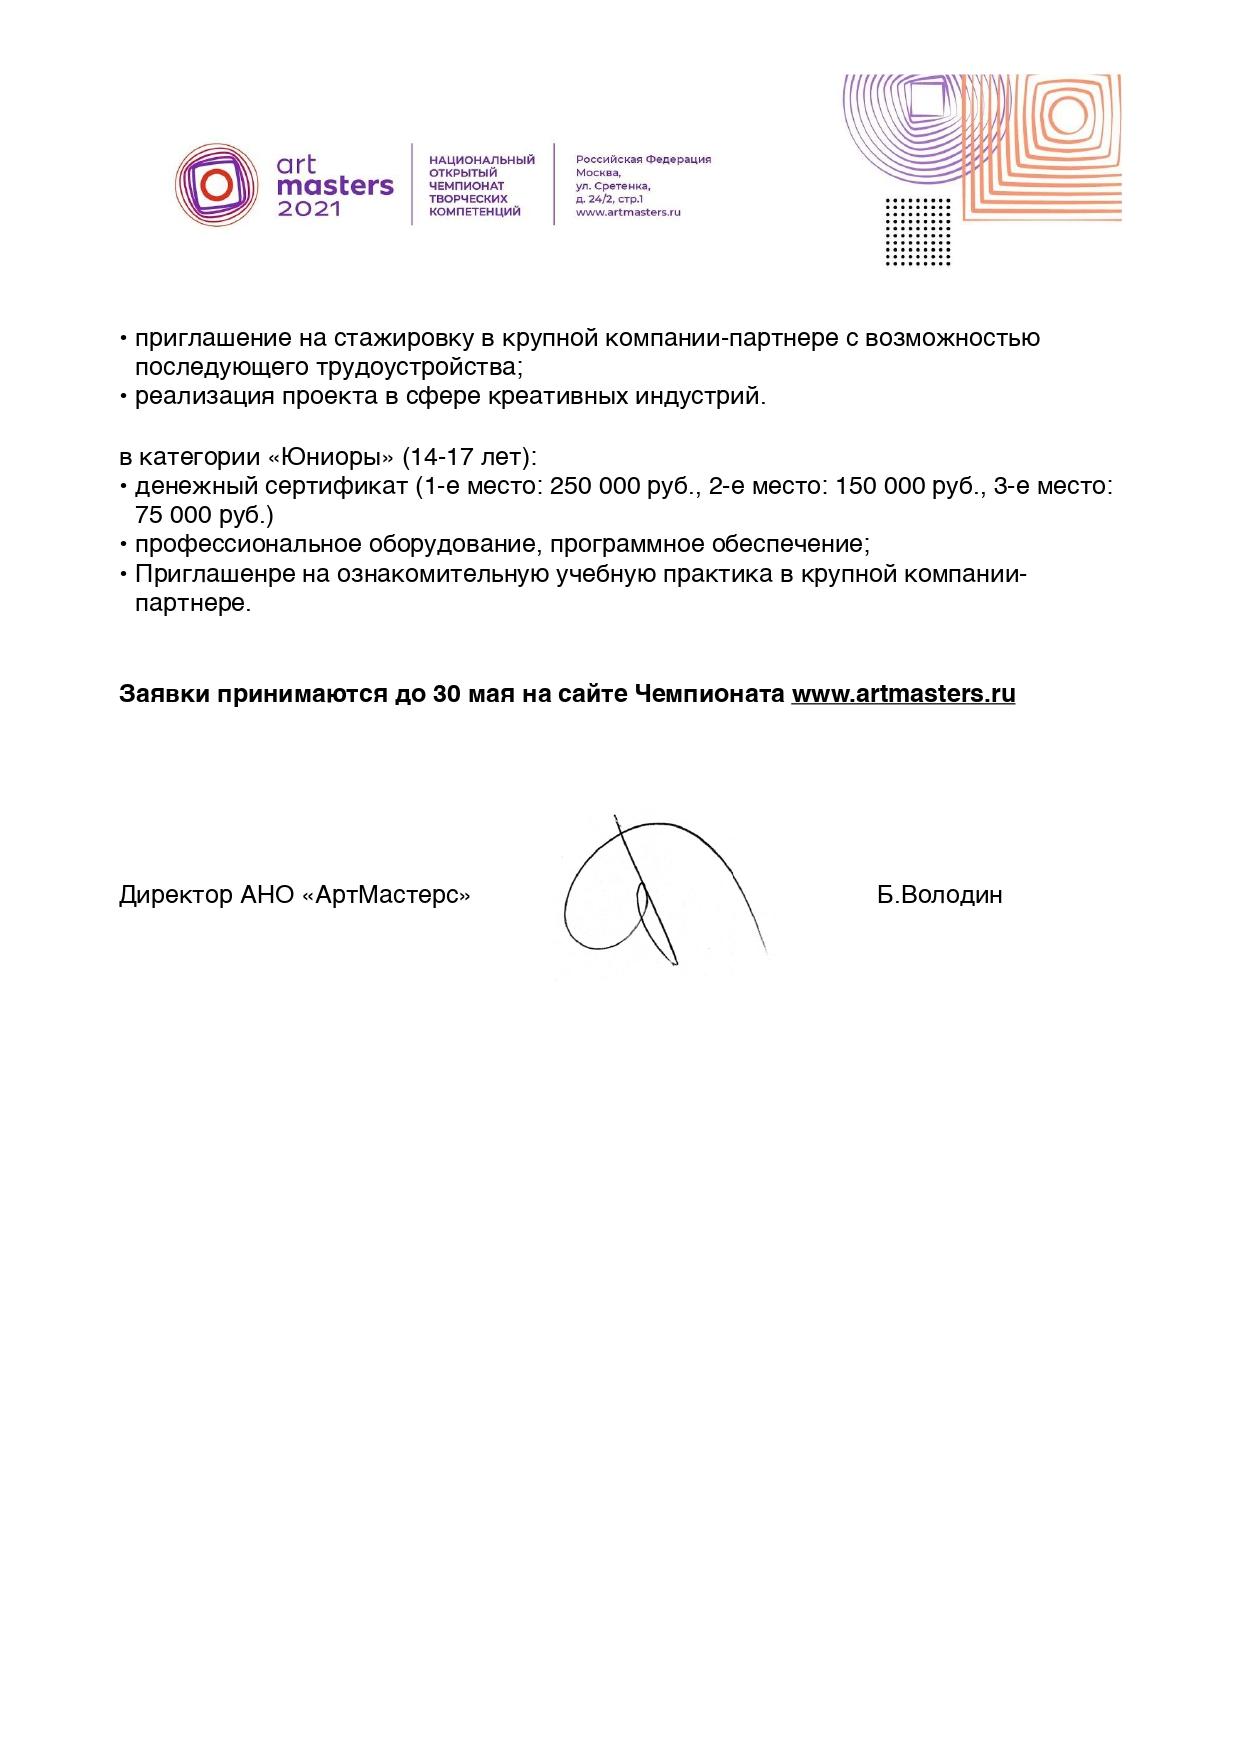 инф. письмо_page-0002